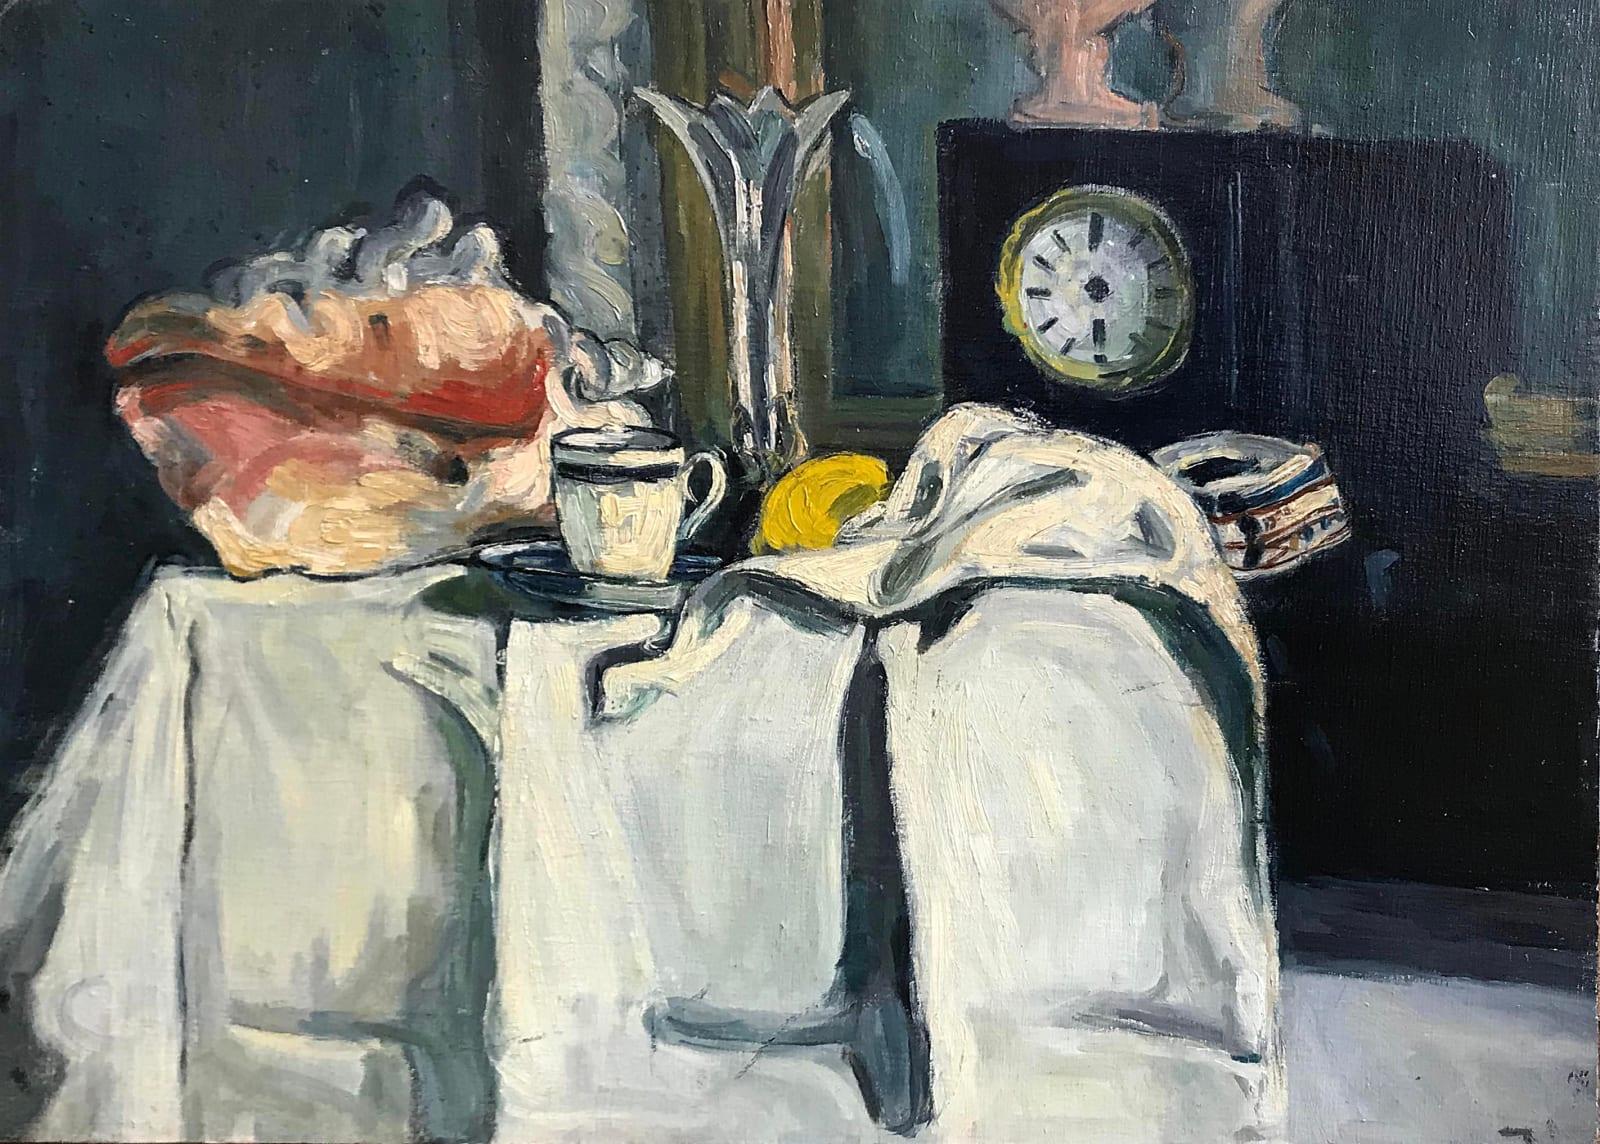 Leonard Mccomb, Copy of Still Life by Paul Cezanne, 1988